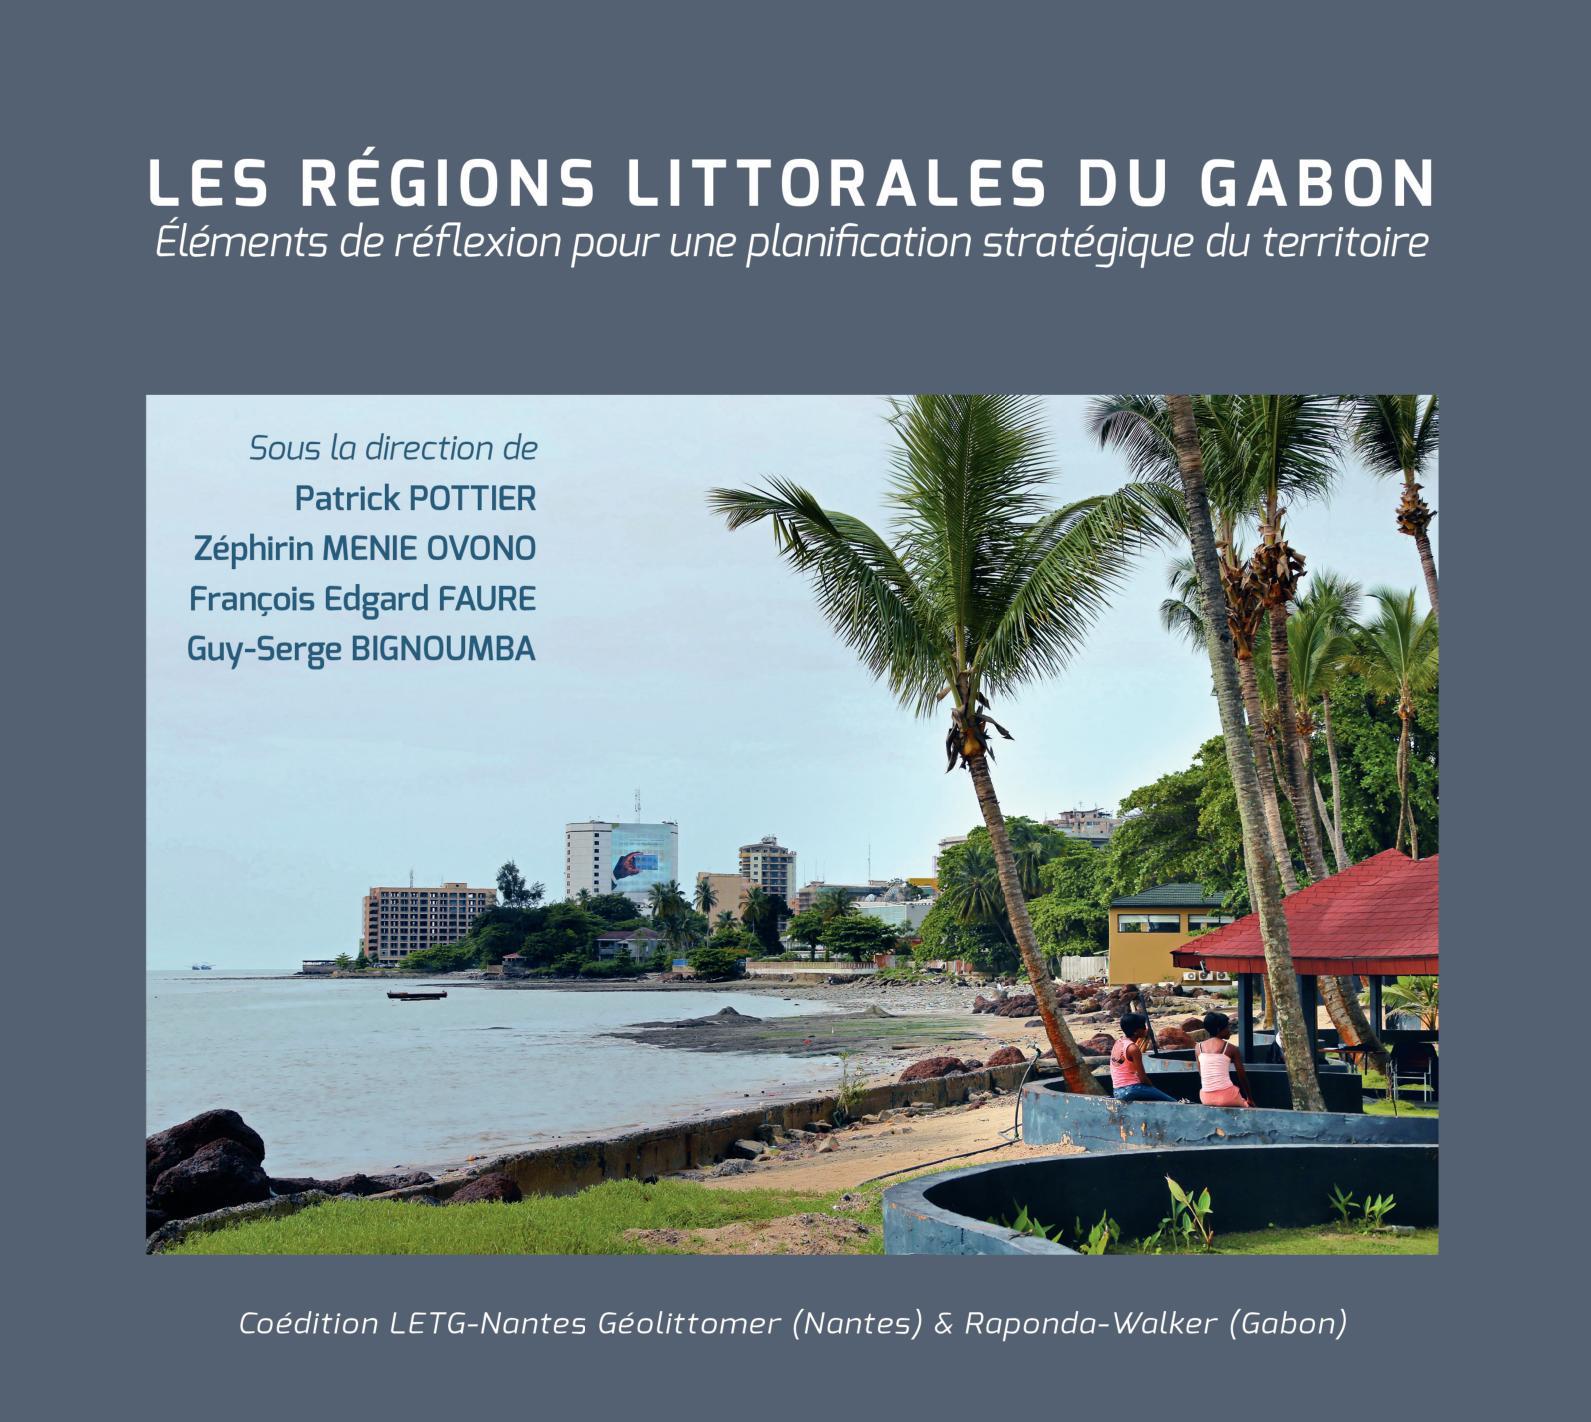 Chaton A Donner Strasbourg Best Of Calaméo Les Regions Littorales Du Gabon